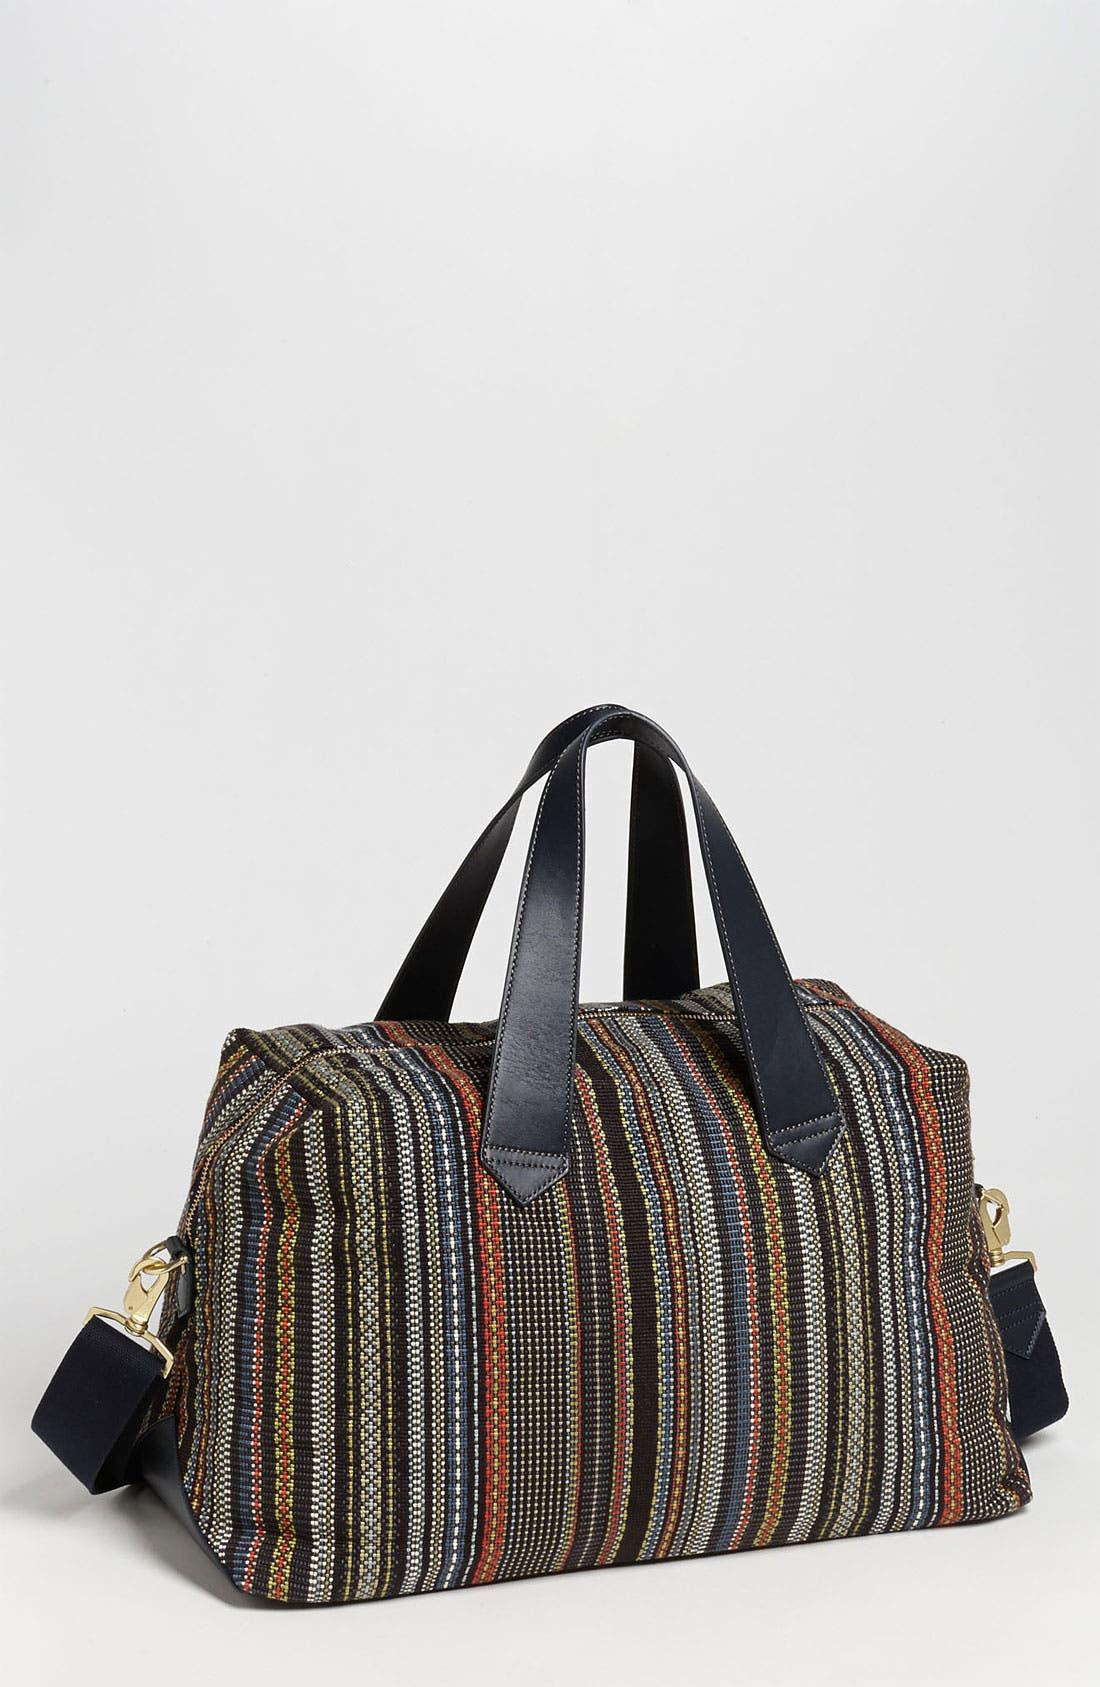 Main Image - Paul Smith Accessories 'Maharam' Bag